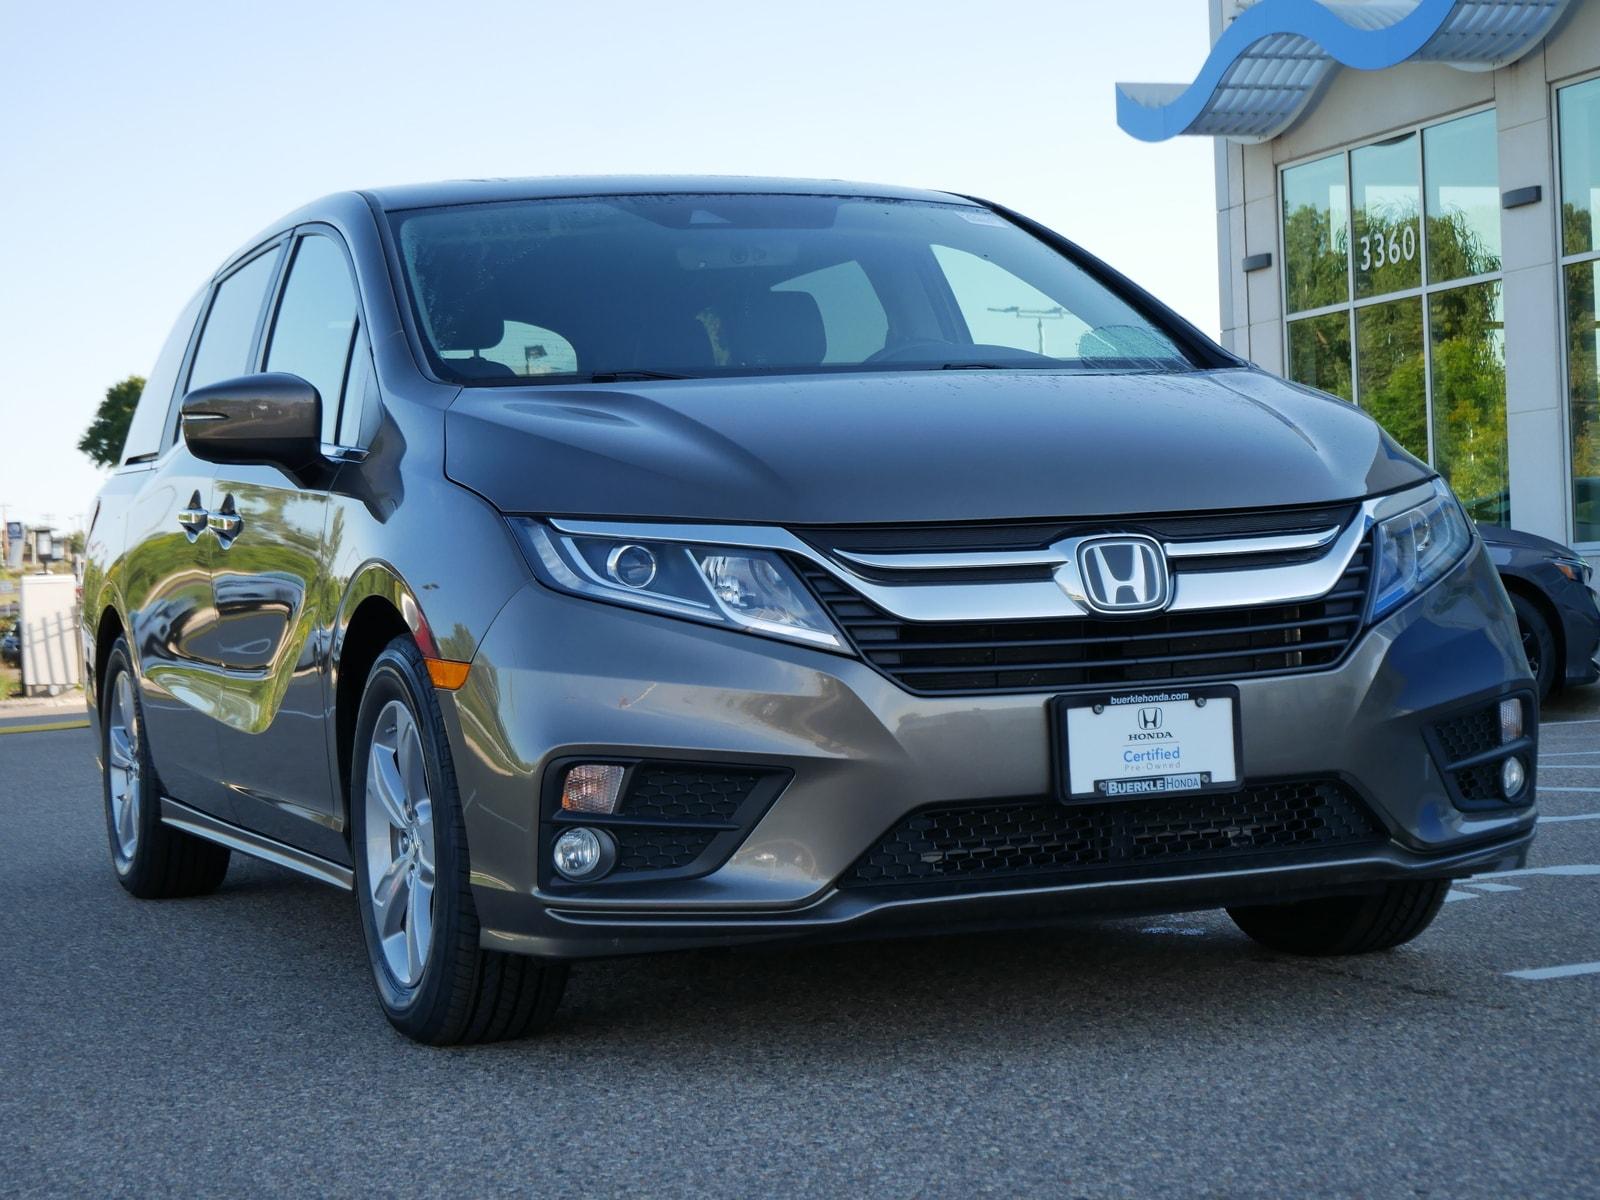 Certified 2019 Honda Odyssey EX-L with VIN 5FNRL6H77KB039661 for sale in Saint Paul, Minnesota